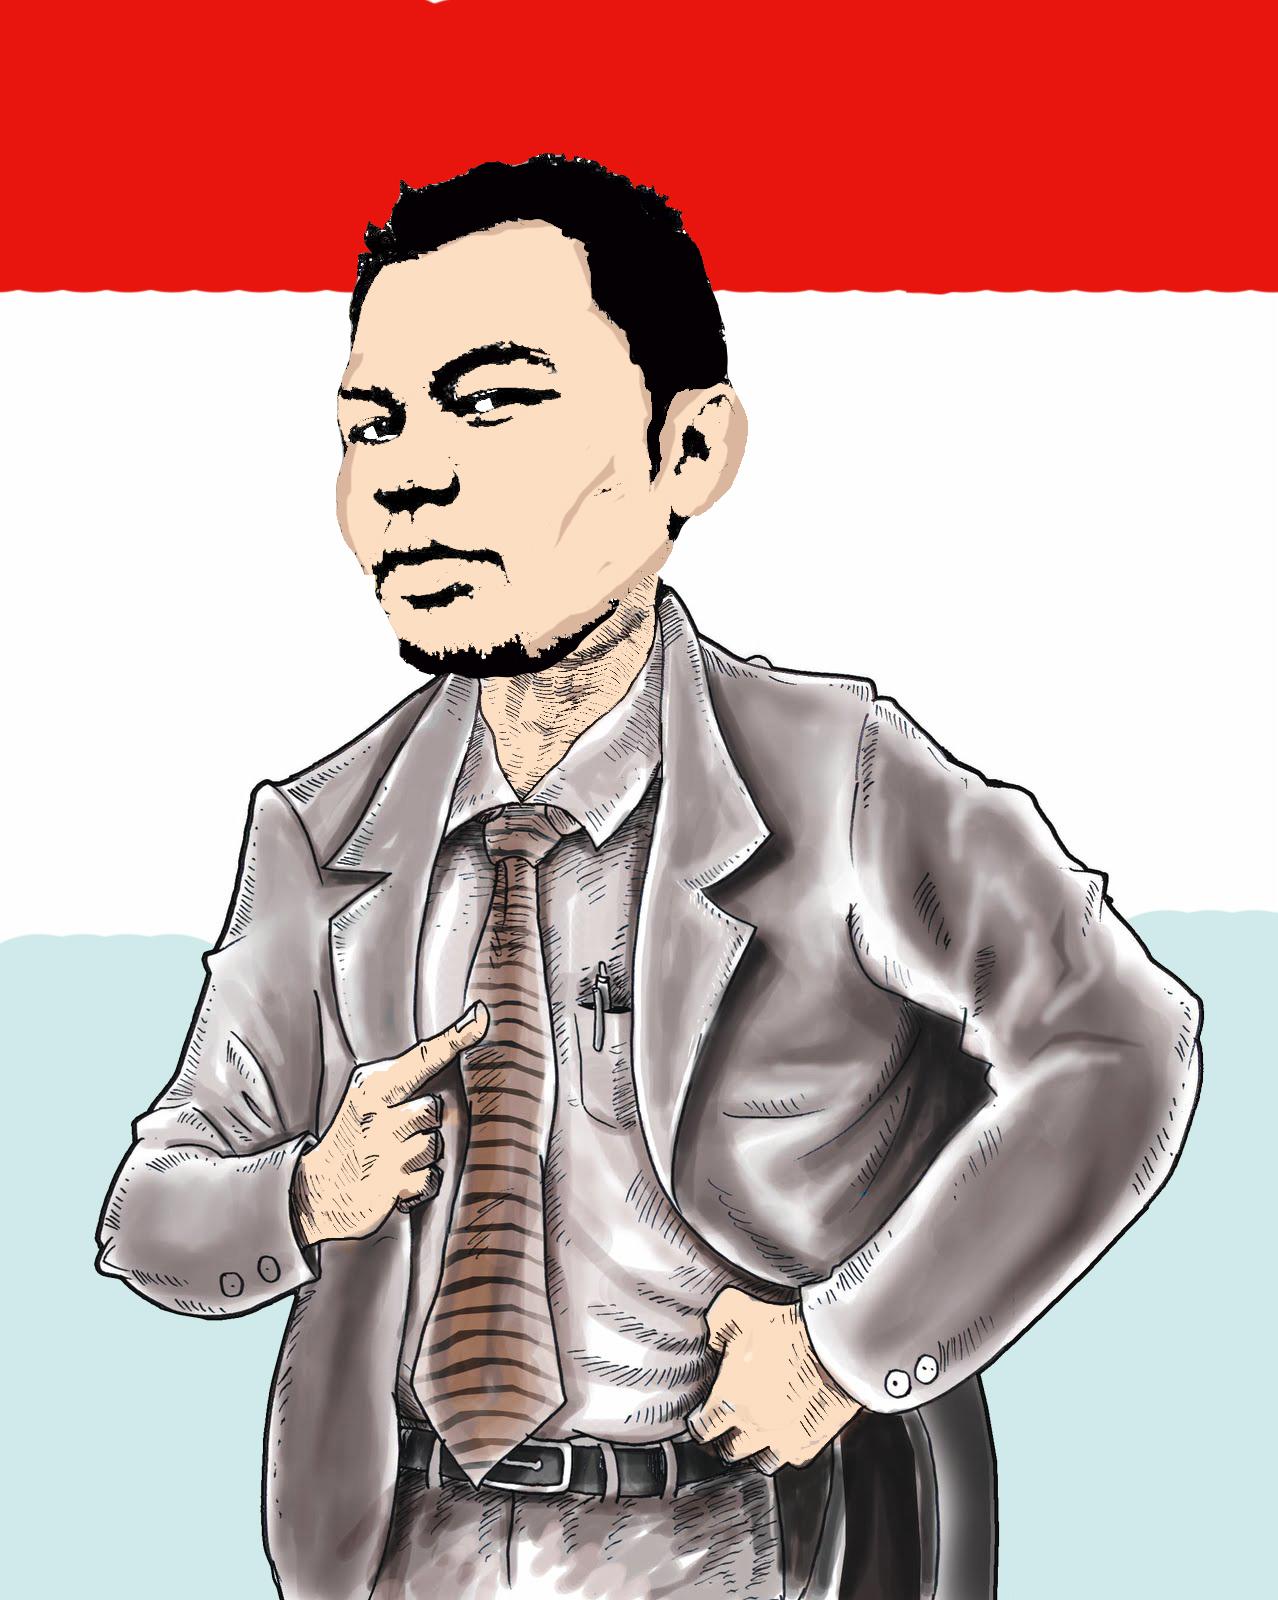 Gambar Karikatur Pahlawan Revolusi